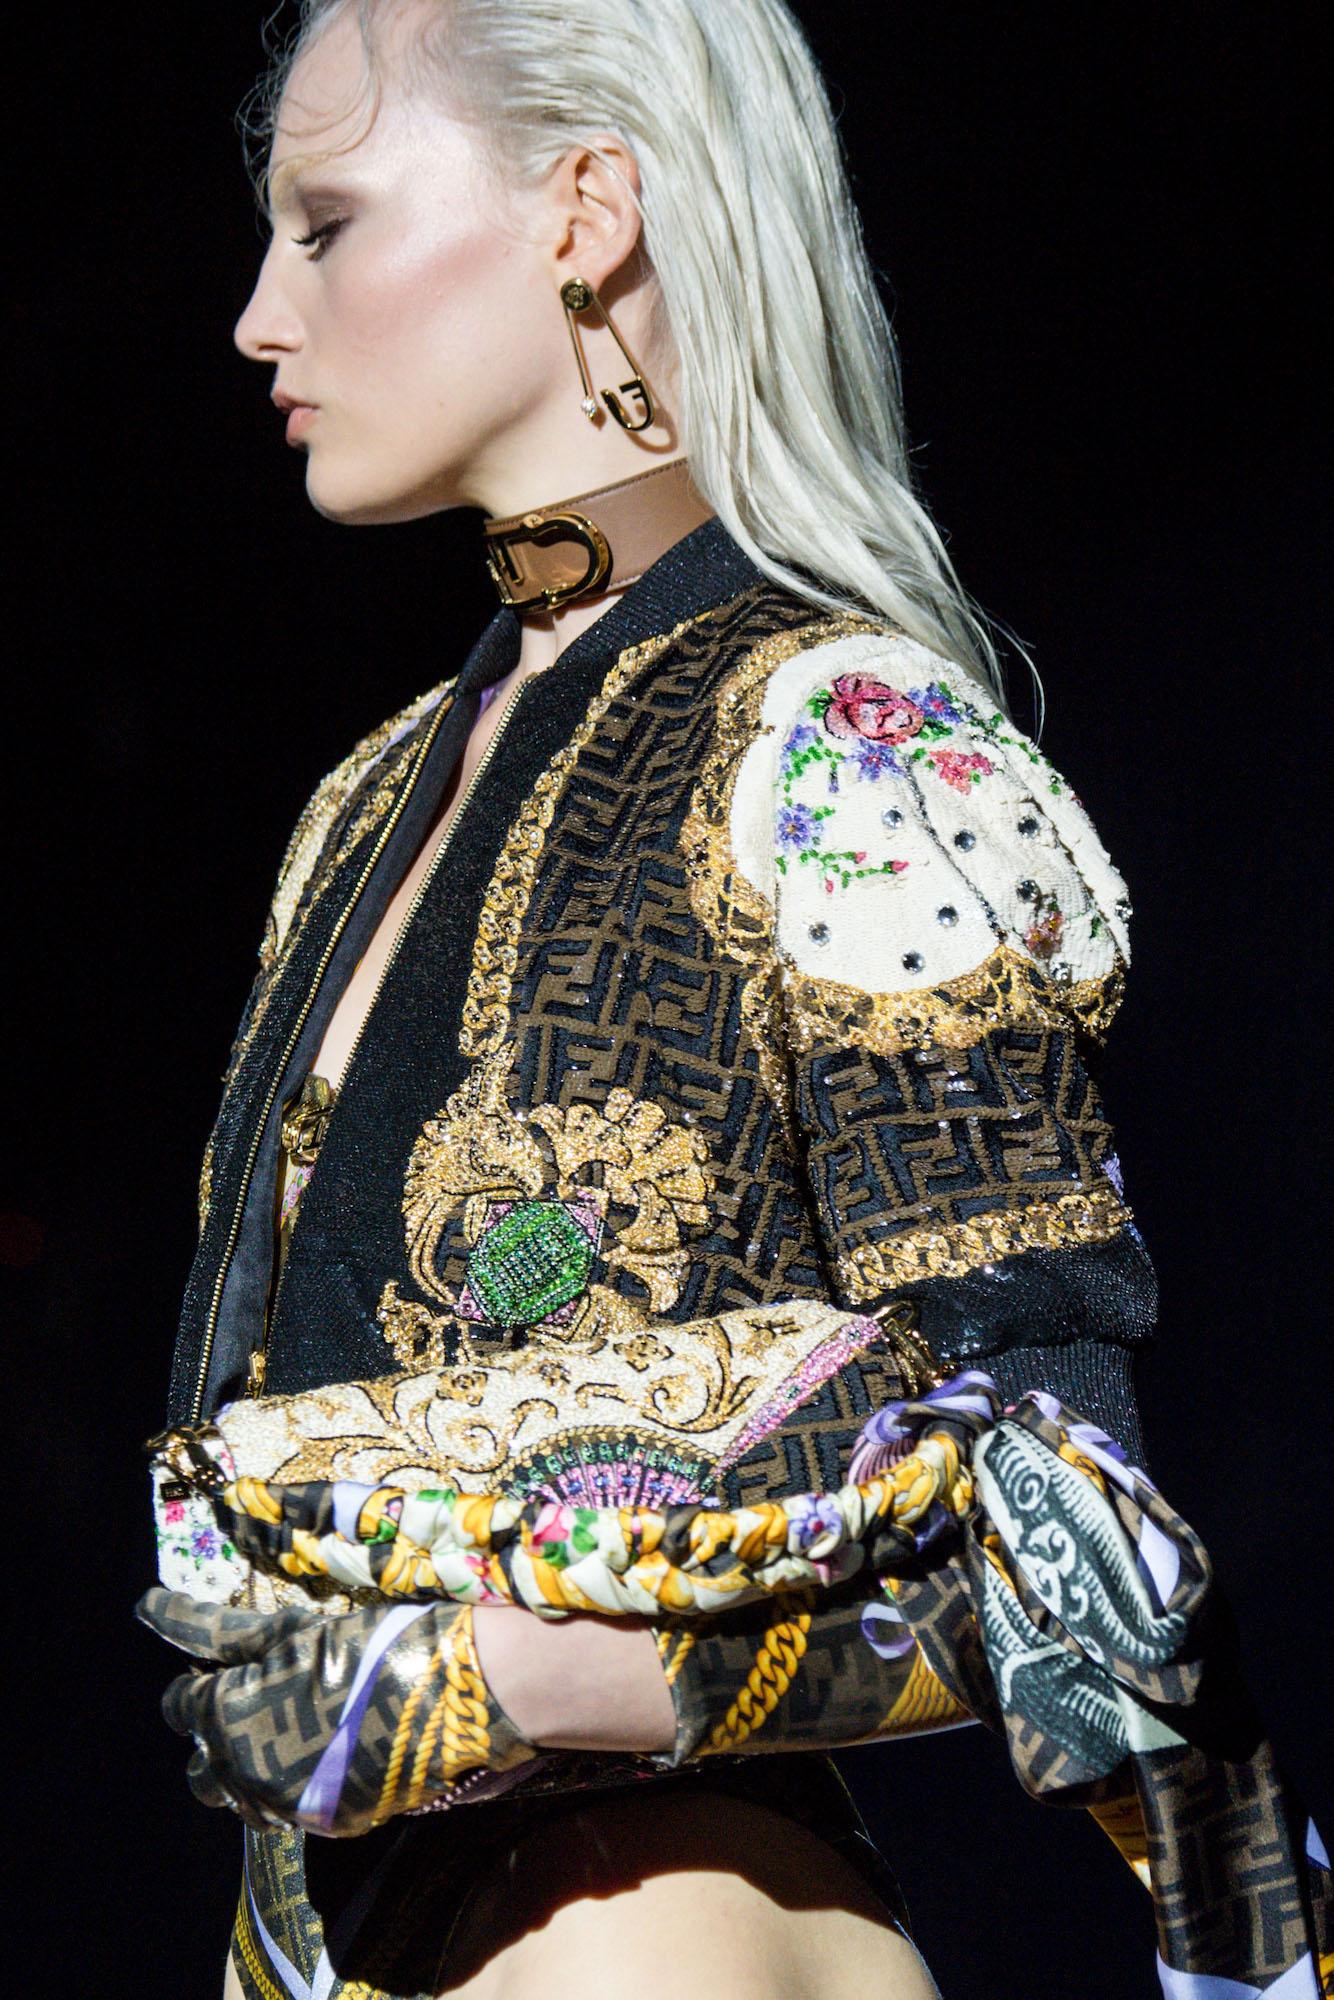 versace by fendi details (23)